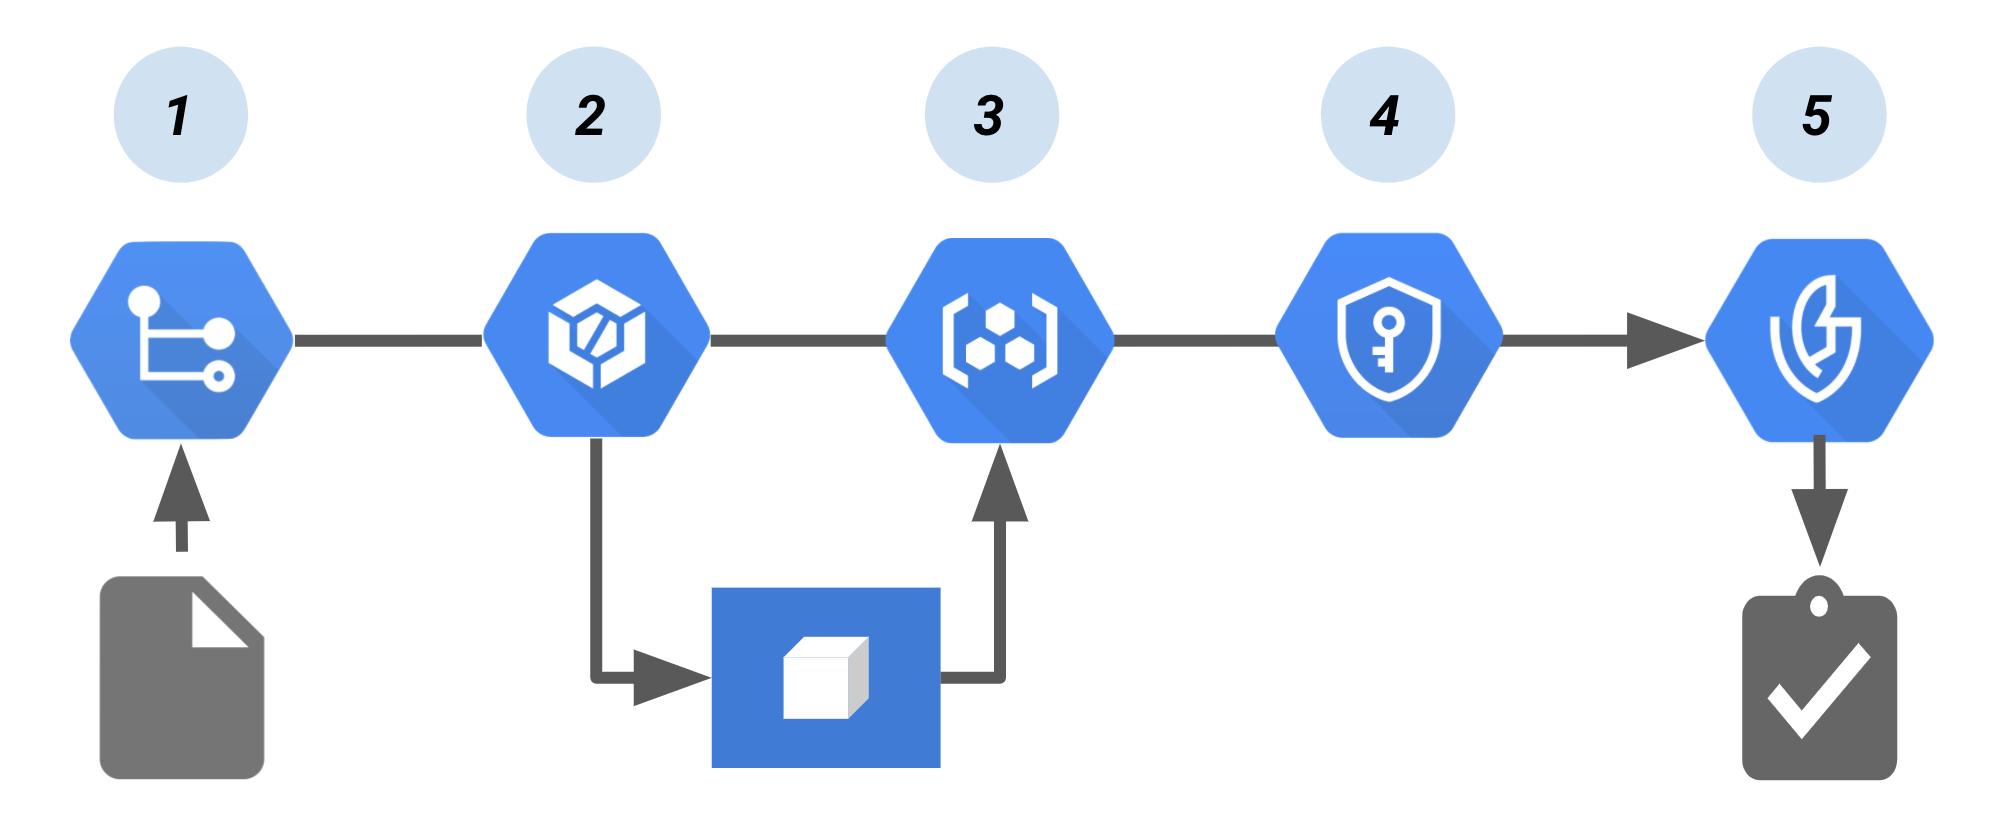 Canalización de certificación de autorizaciónbinaria de CloudBuild.